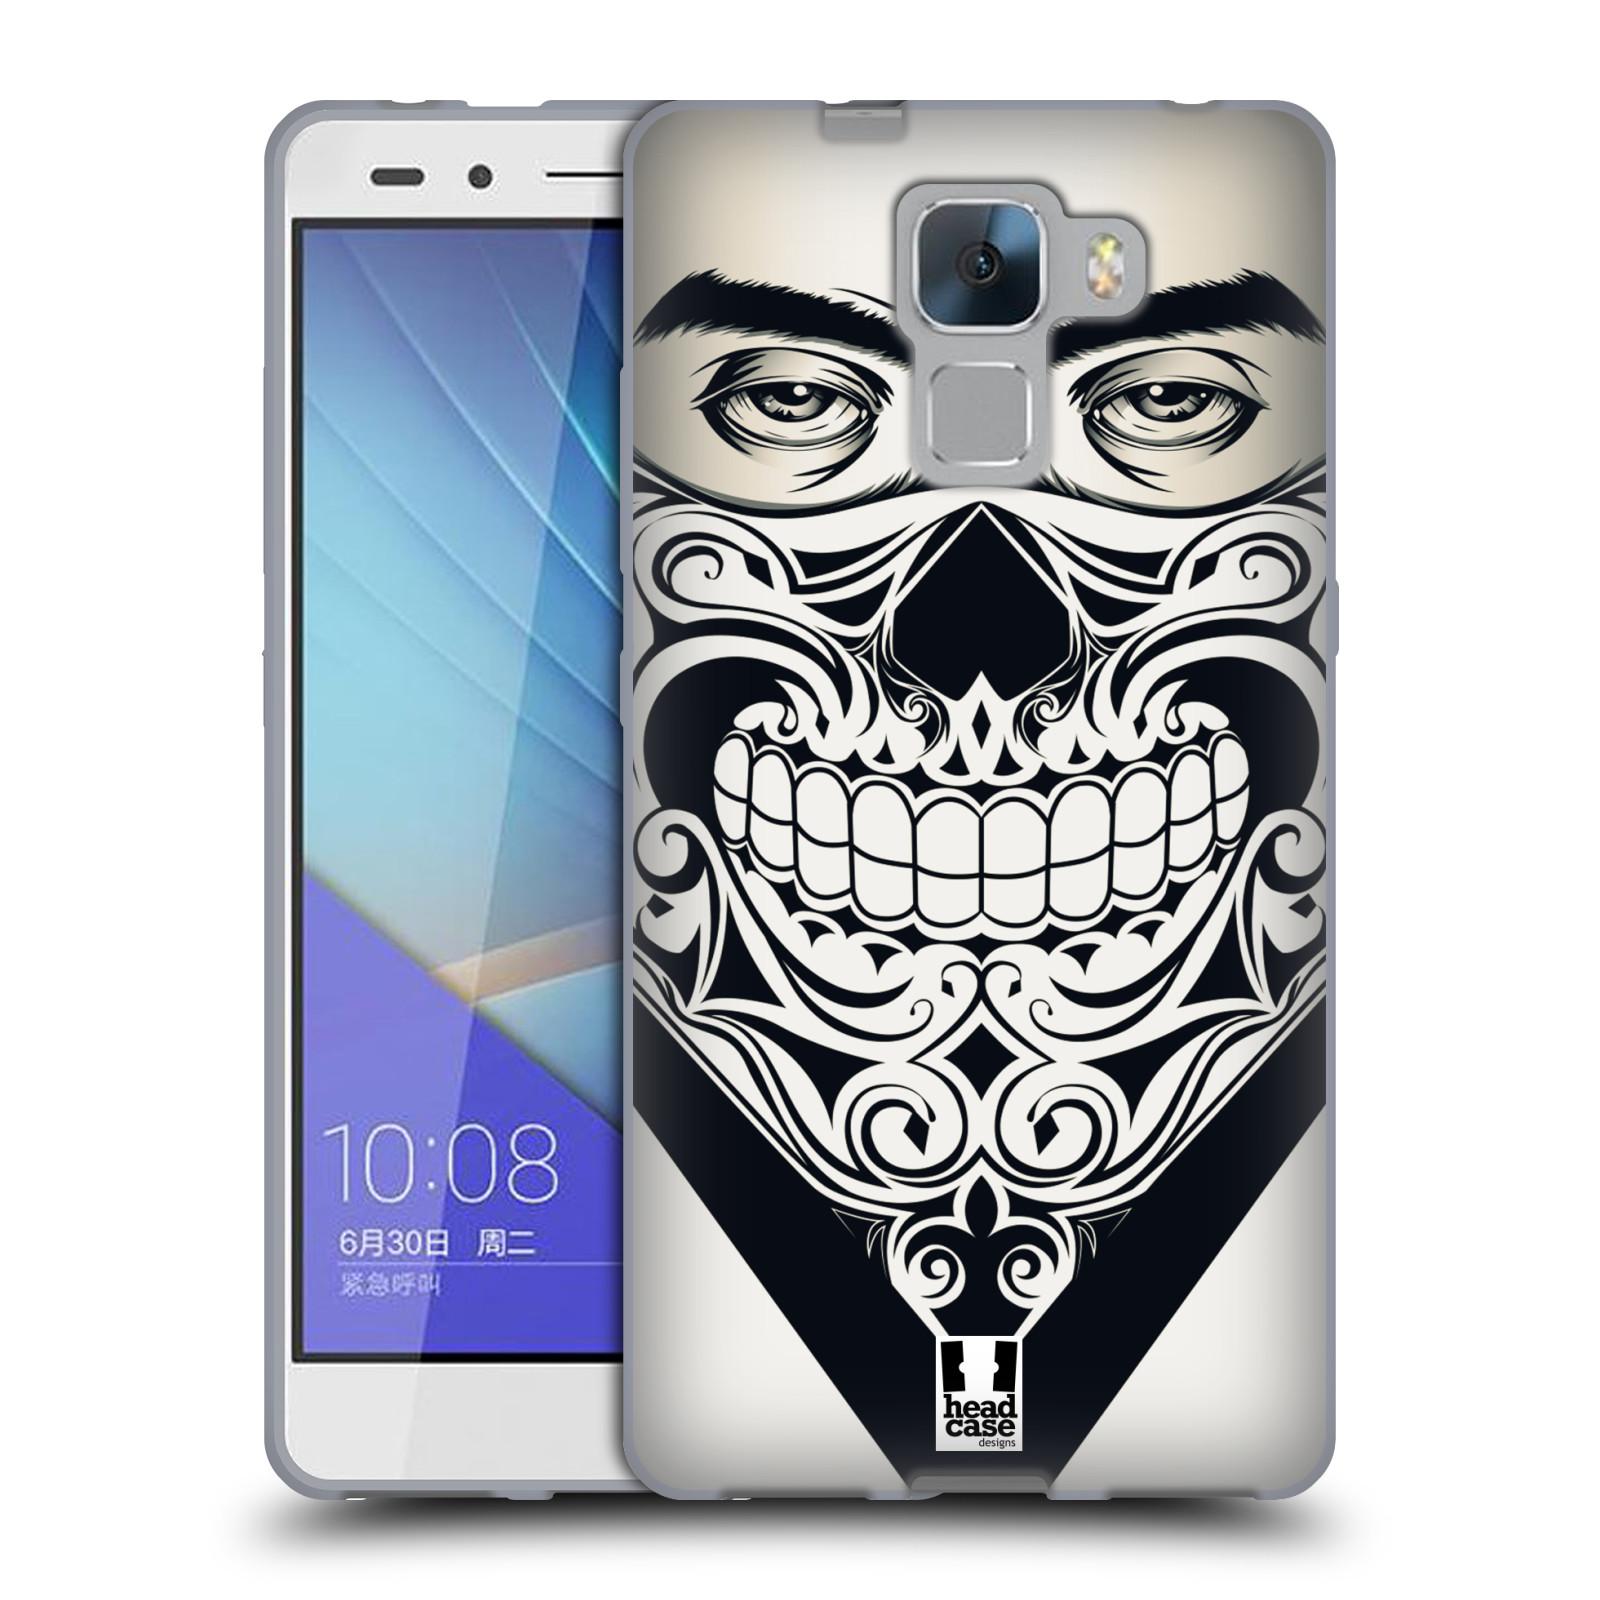 Silikonové pouzdro na mobil Honor 7 HEAD CASE LEBKA BANDANA